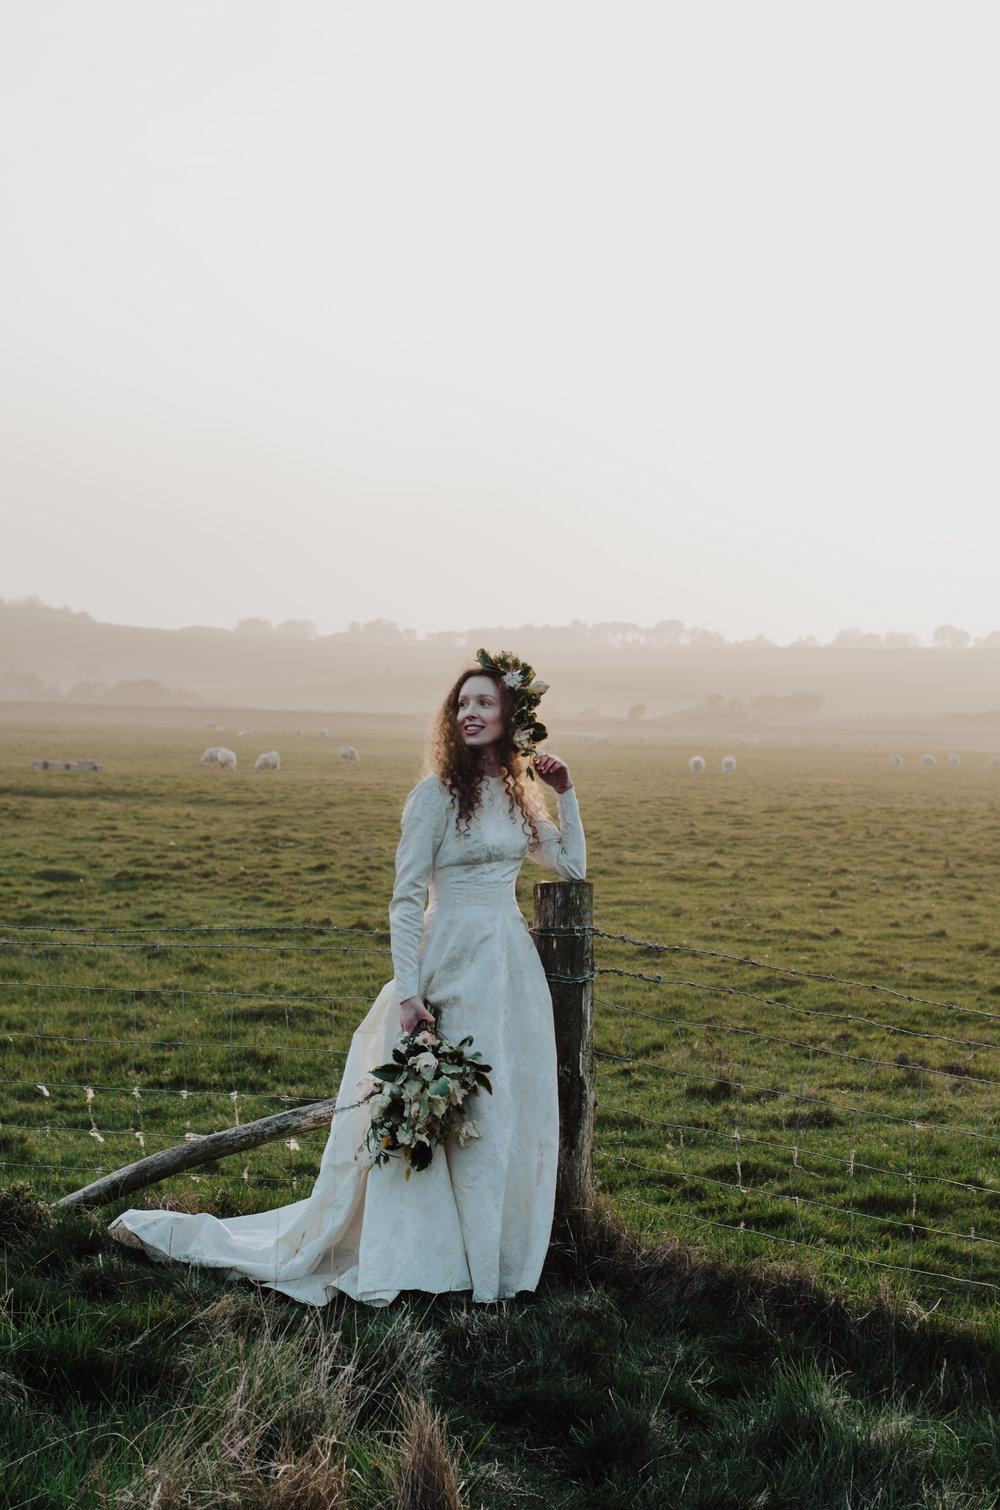 Bridal - Cuckmere Haven 2018 - Aiste Saulyte Photography-44.jpg